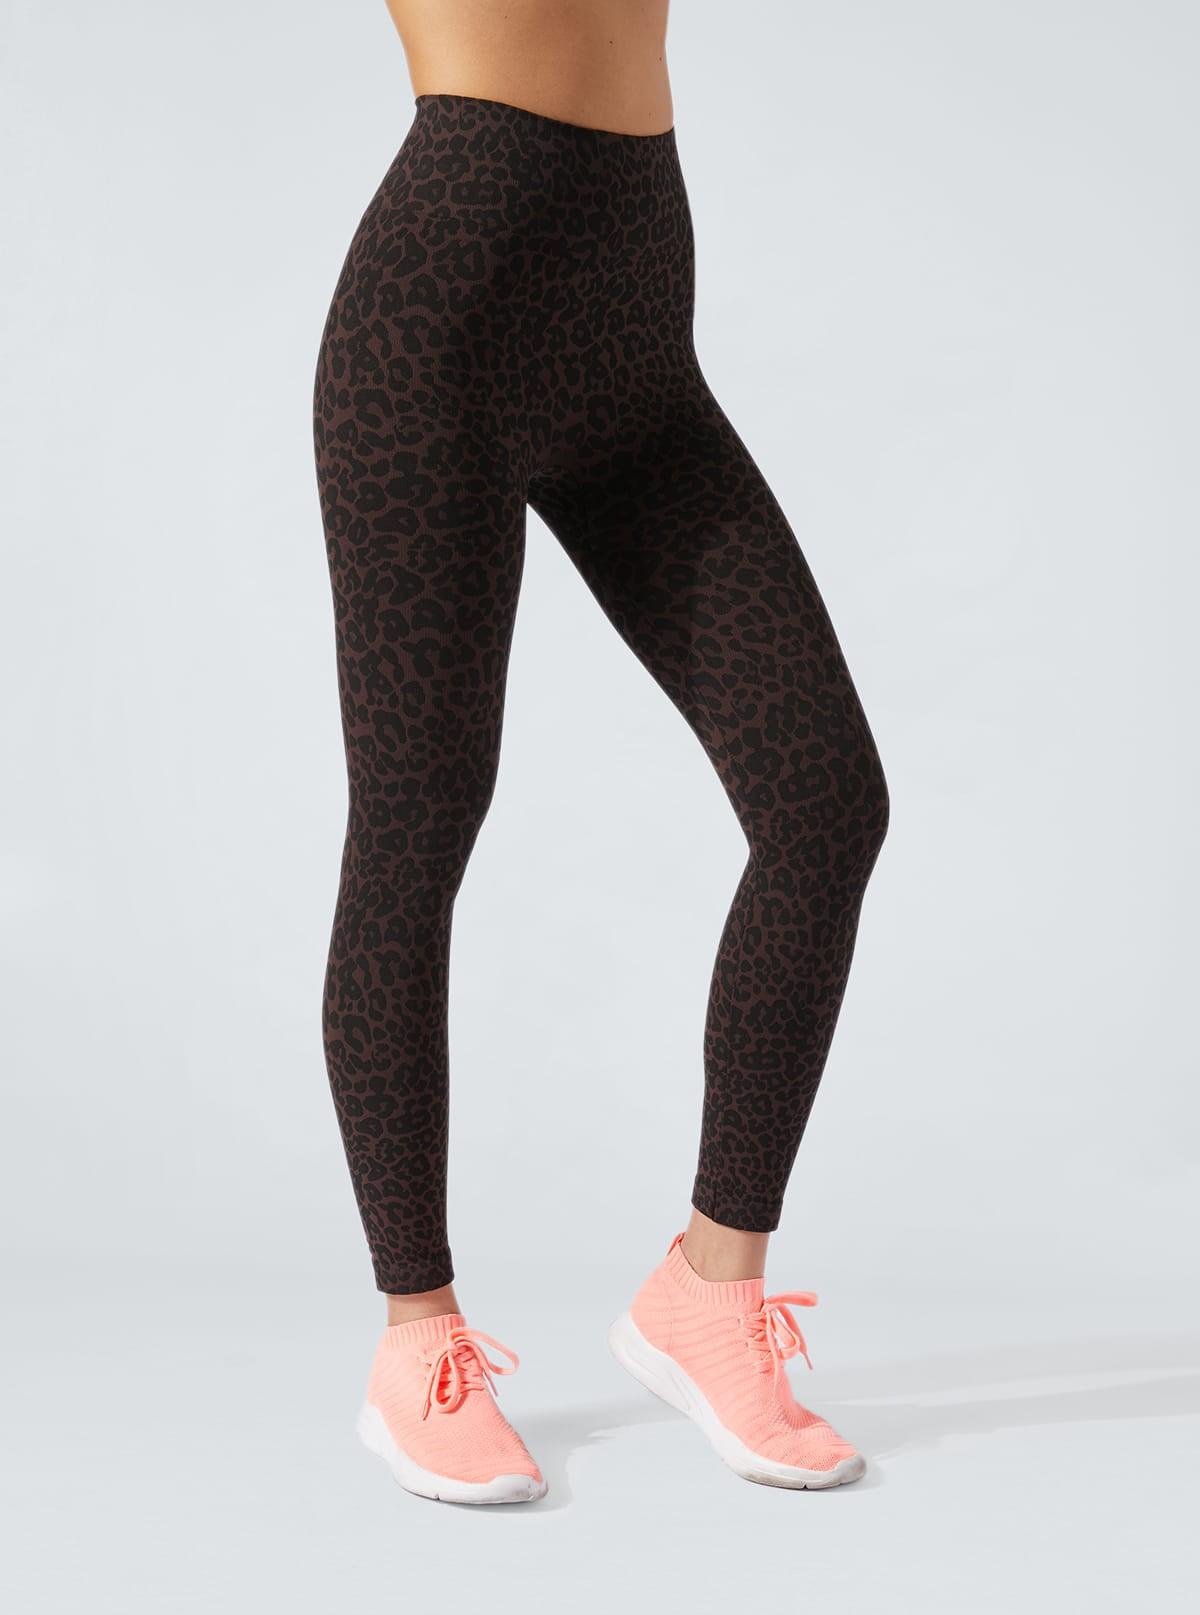 Leggings Animalier Moteados negro-marròn hidratantes con efecto estilizante